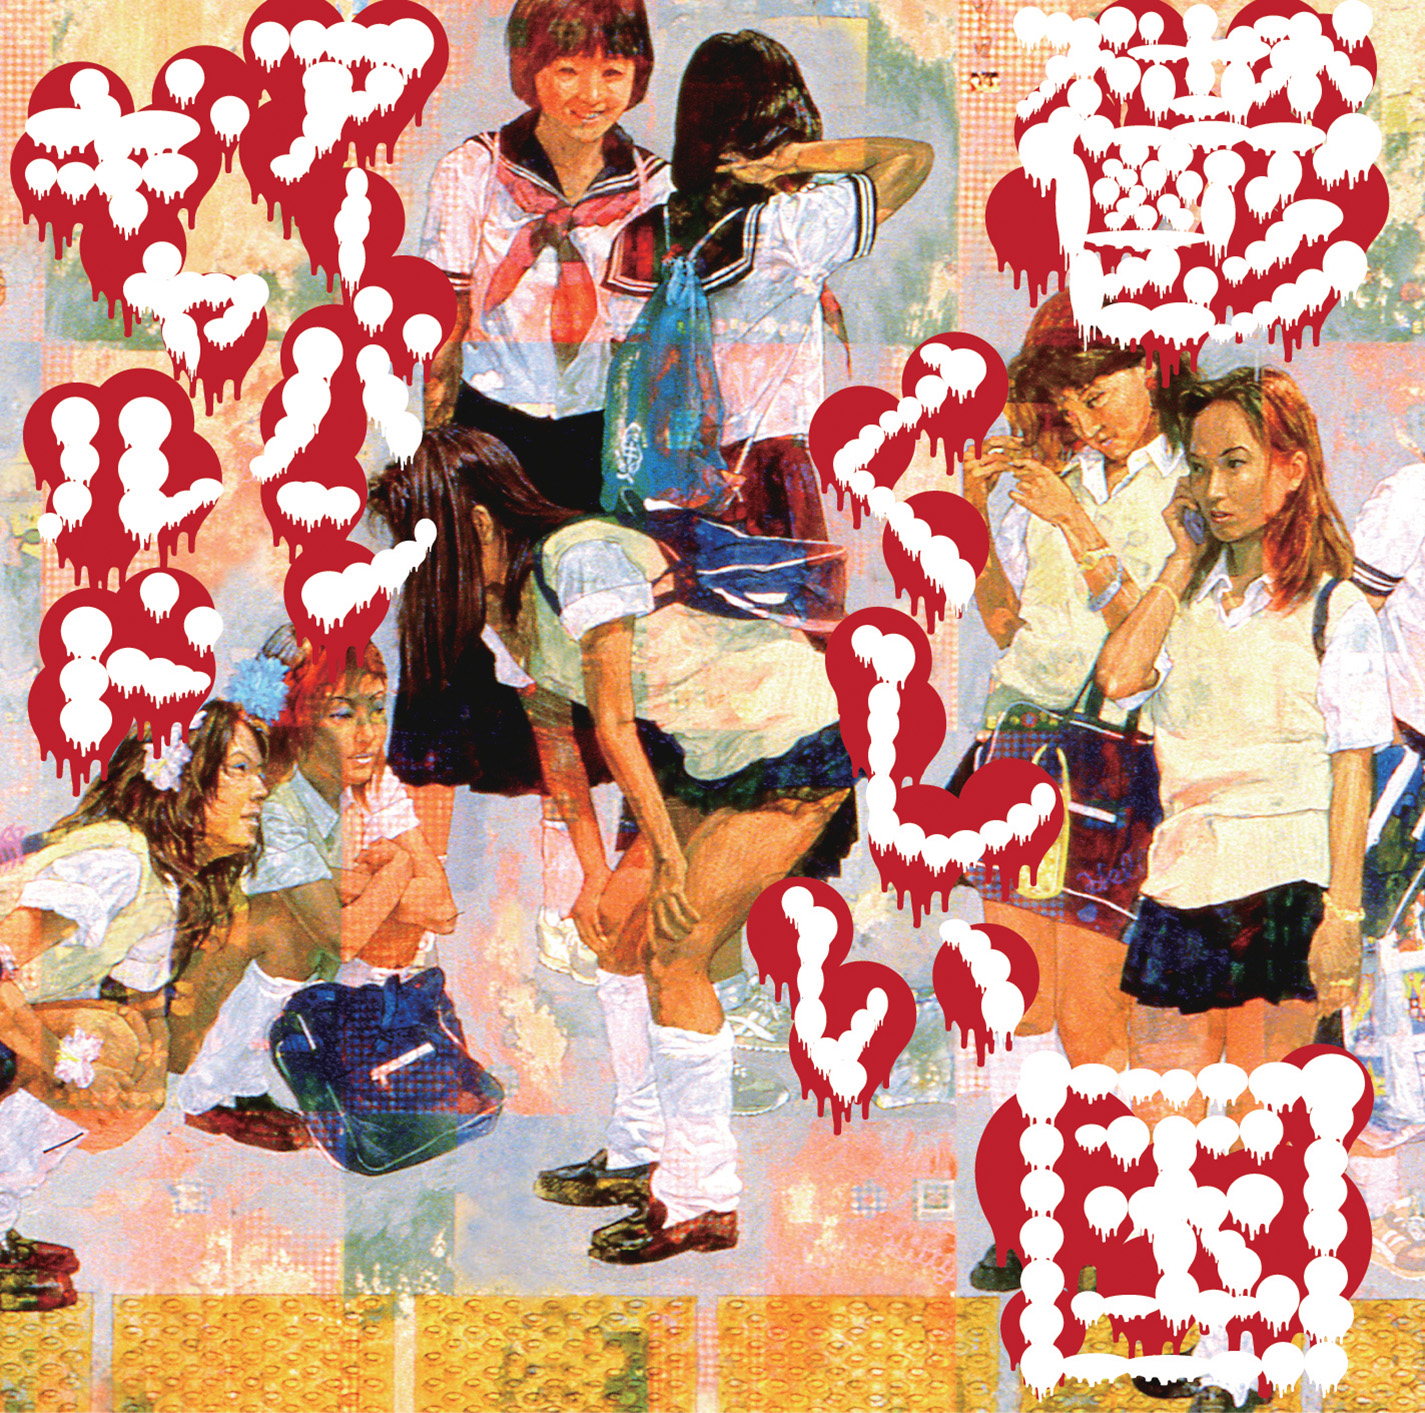 URBANGARDE - Utsukushii Kuni